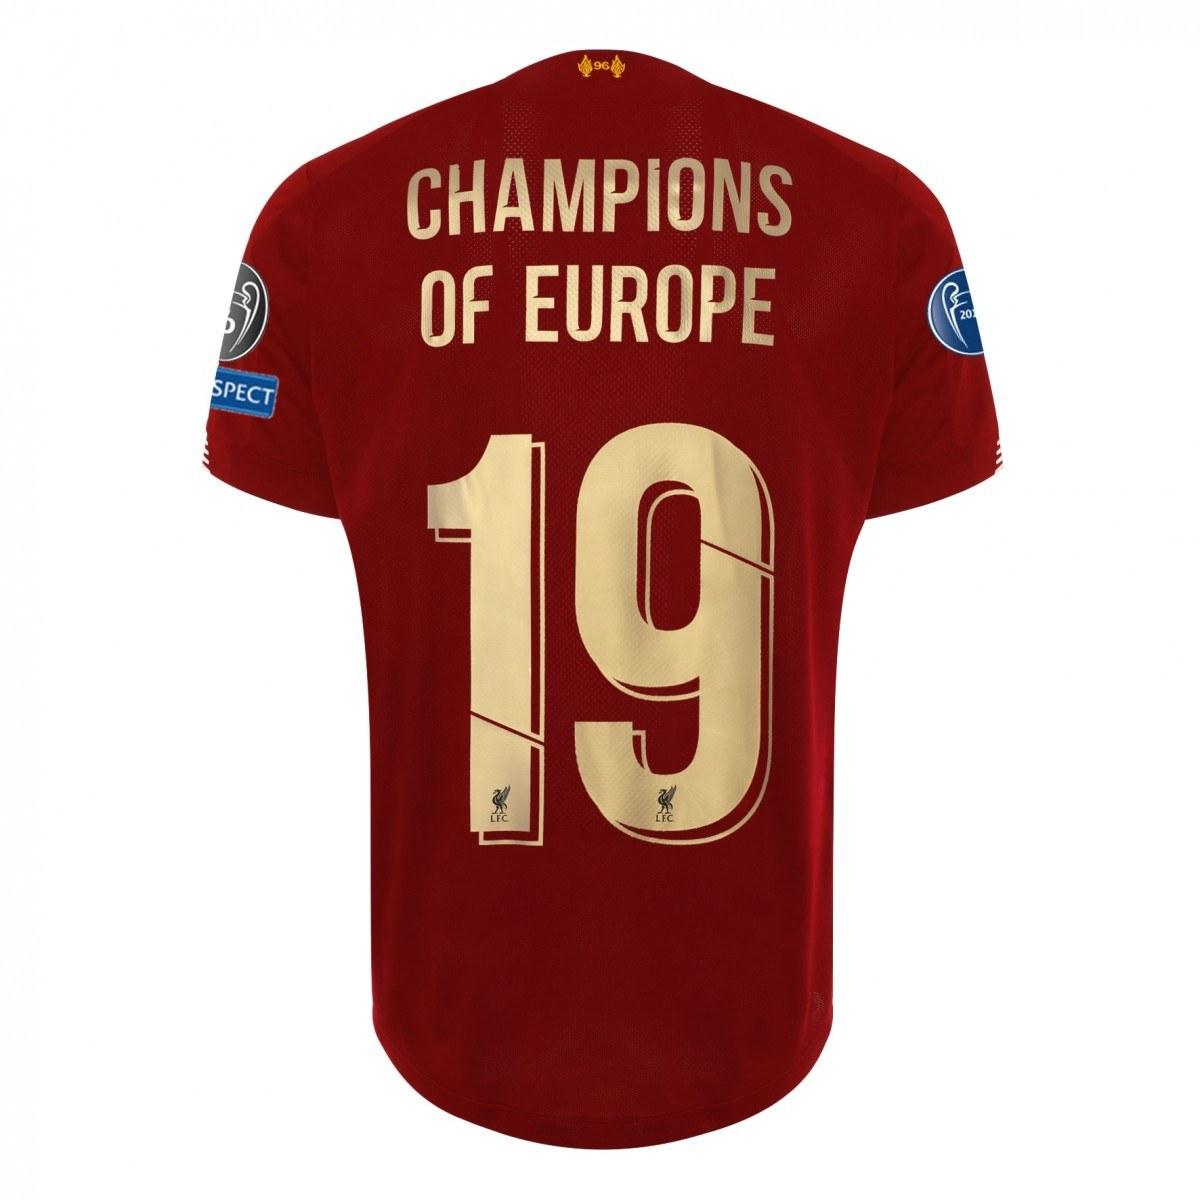 H Λίβερπουλ είναι η νέα πρωταθλήτρια Ευρώπης. Και η νέα σεζόν, η οποία θα αρχίσει σε περίπου 2 μήνες θα έχει μία σημαντική αλλαγή στη φανέλα της.